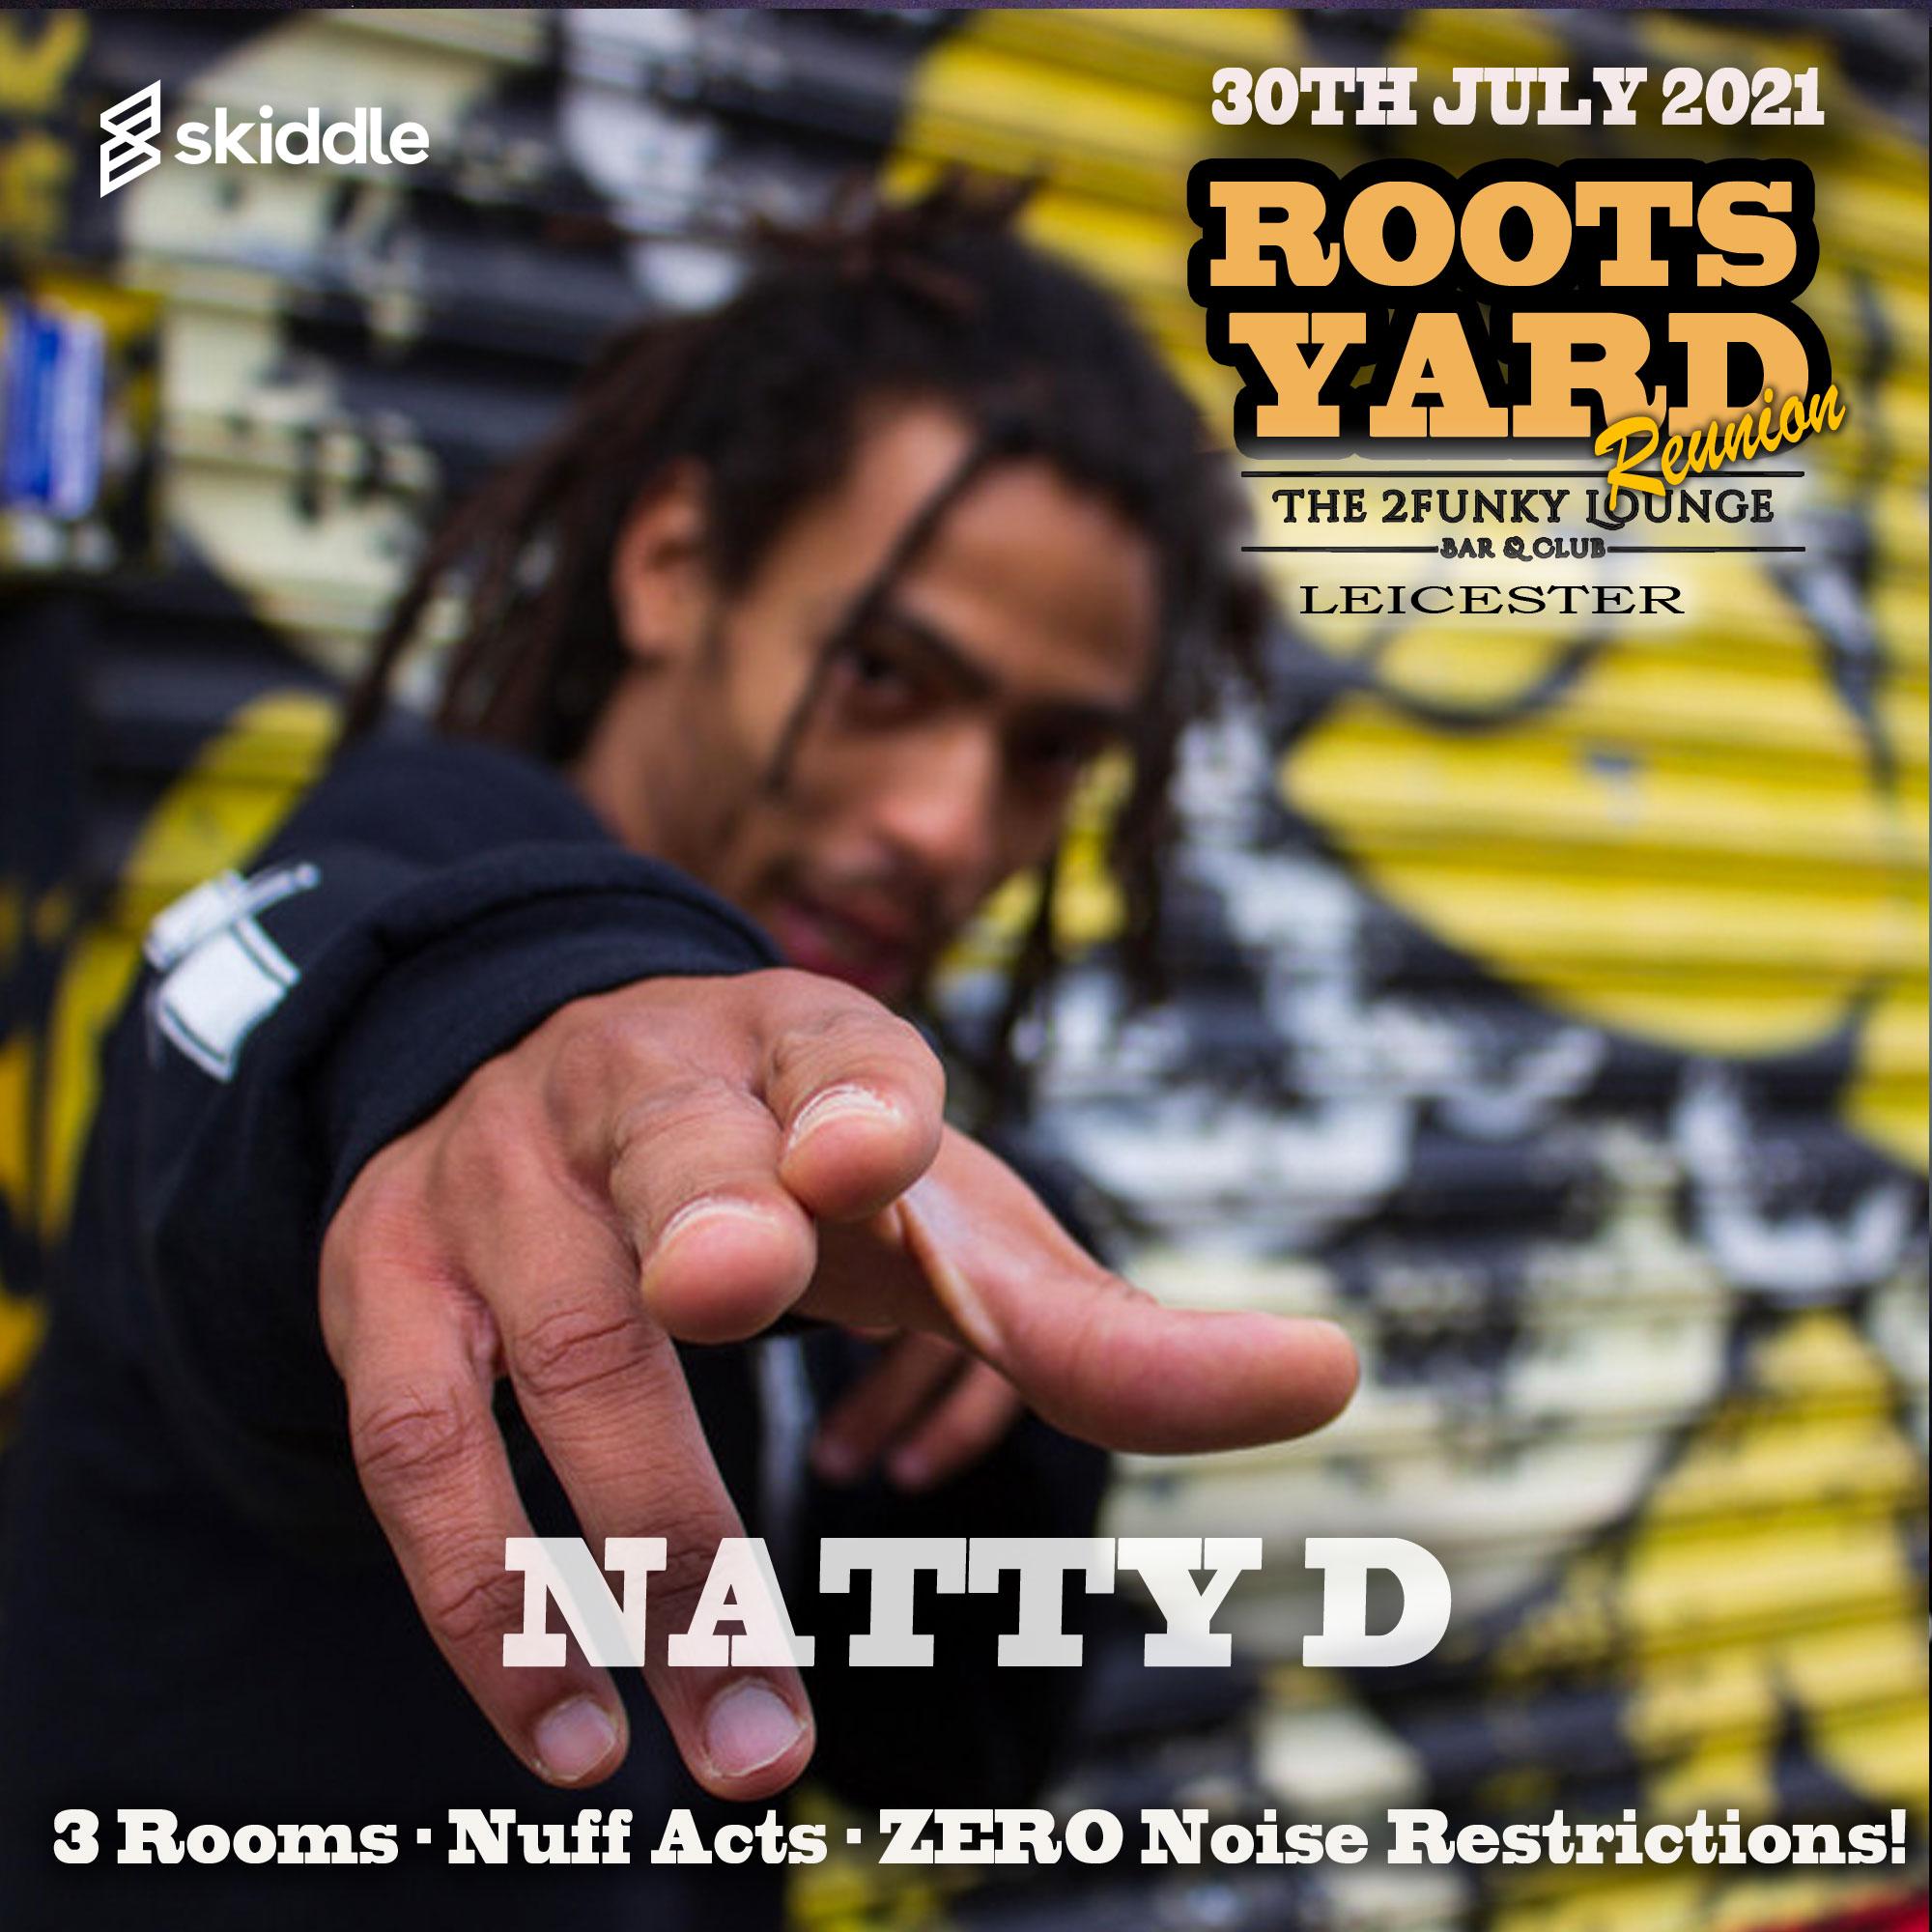 natty-d-roots-yard-reunion-insta-post